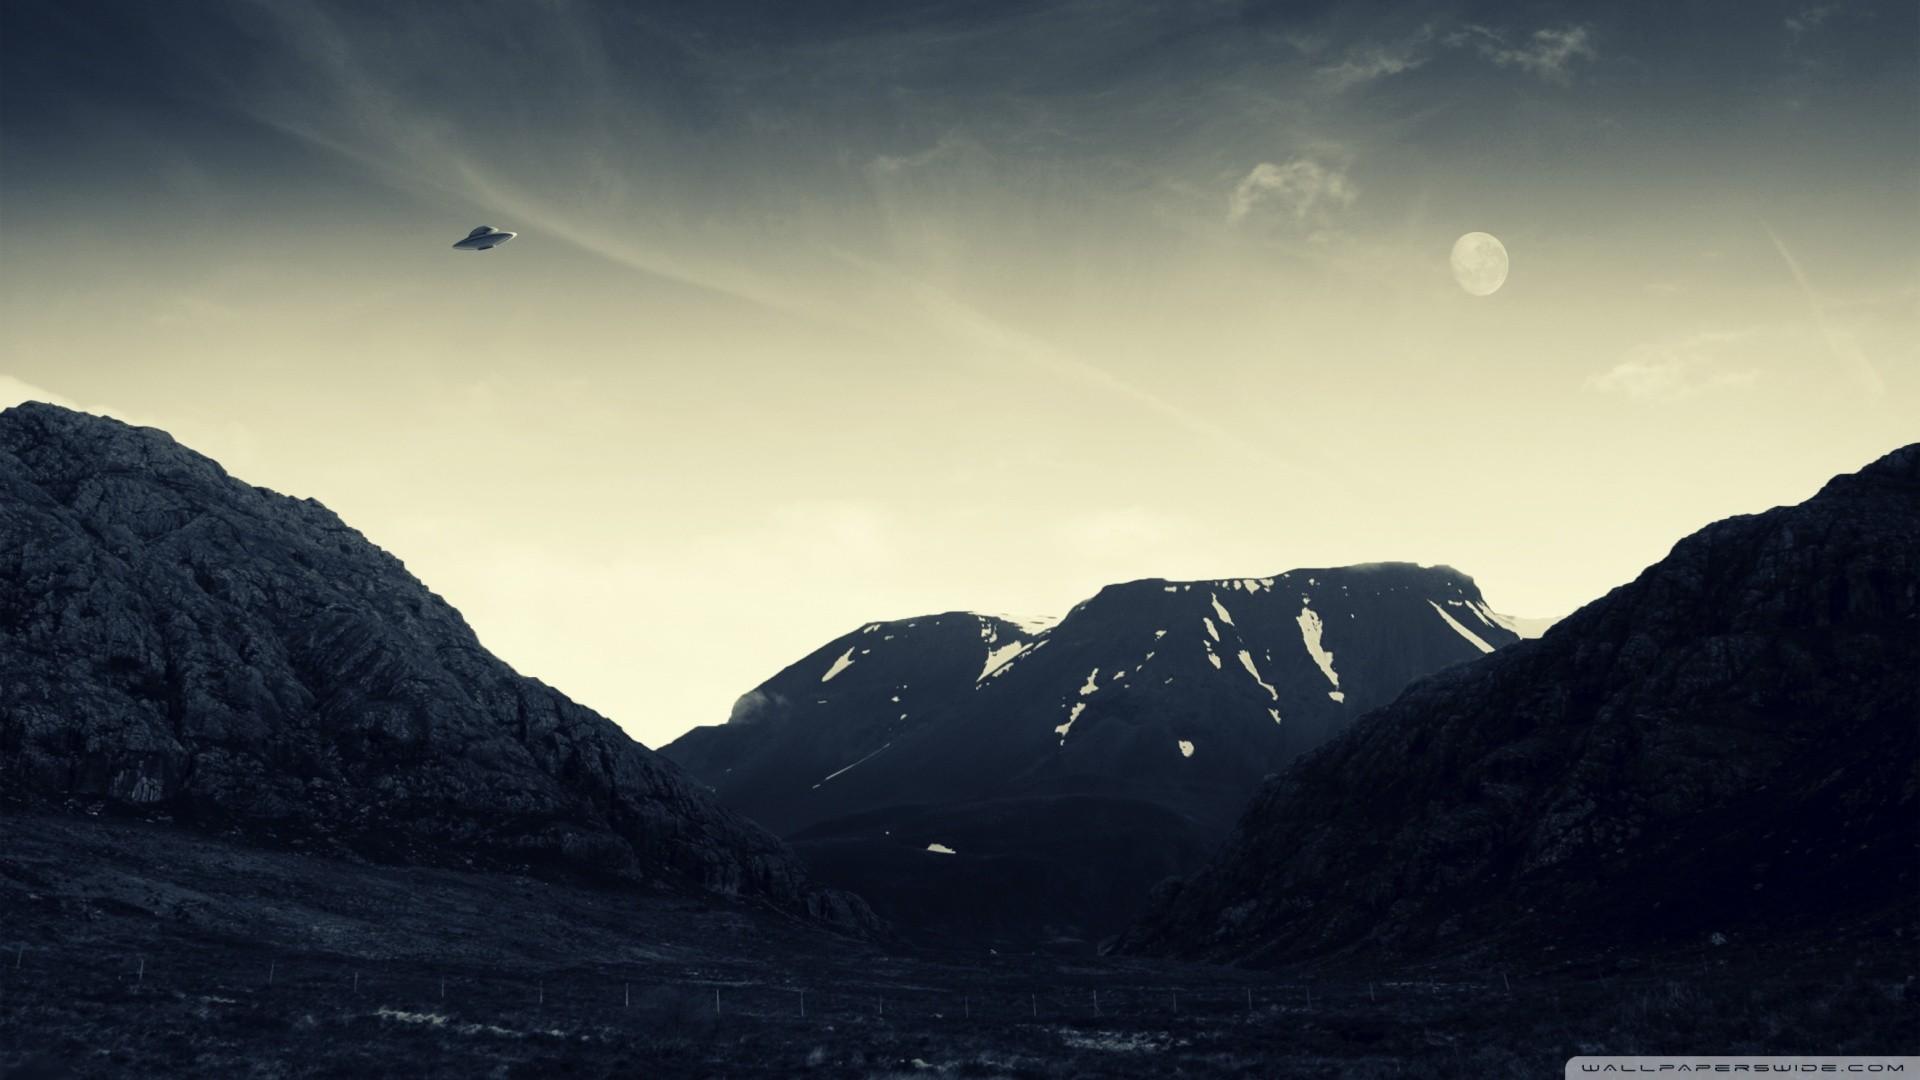 Ufo Wallpaper HD (72+ Images